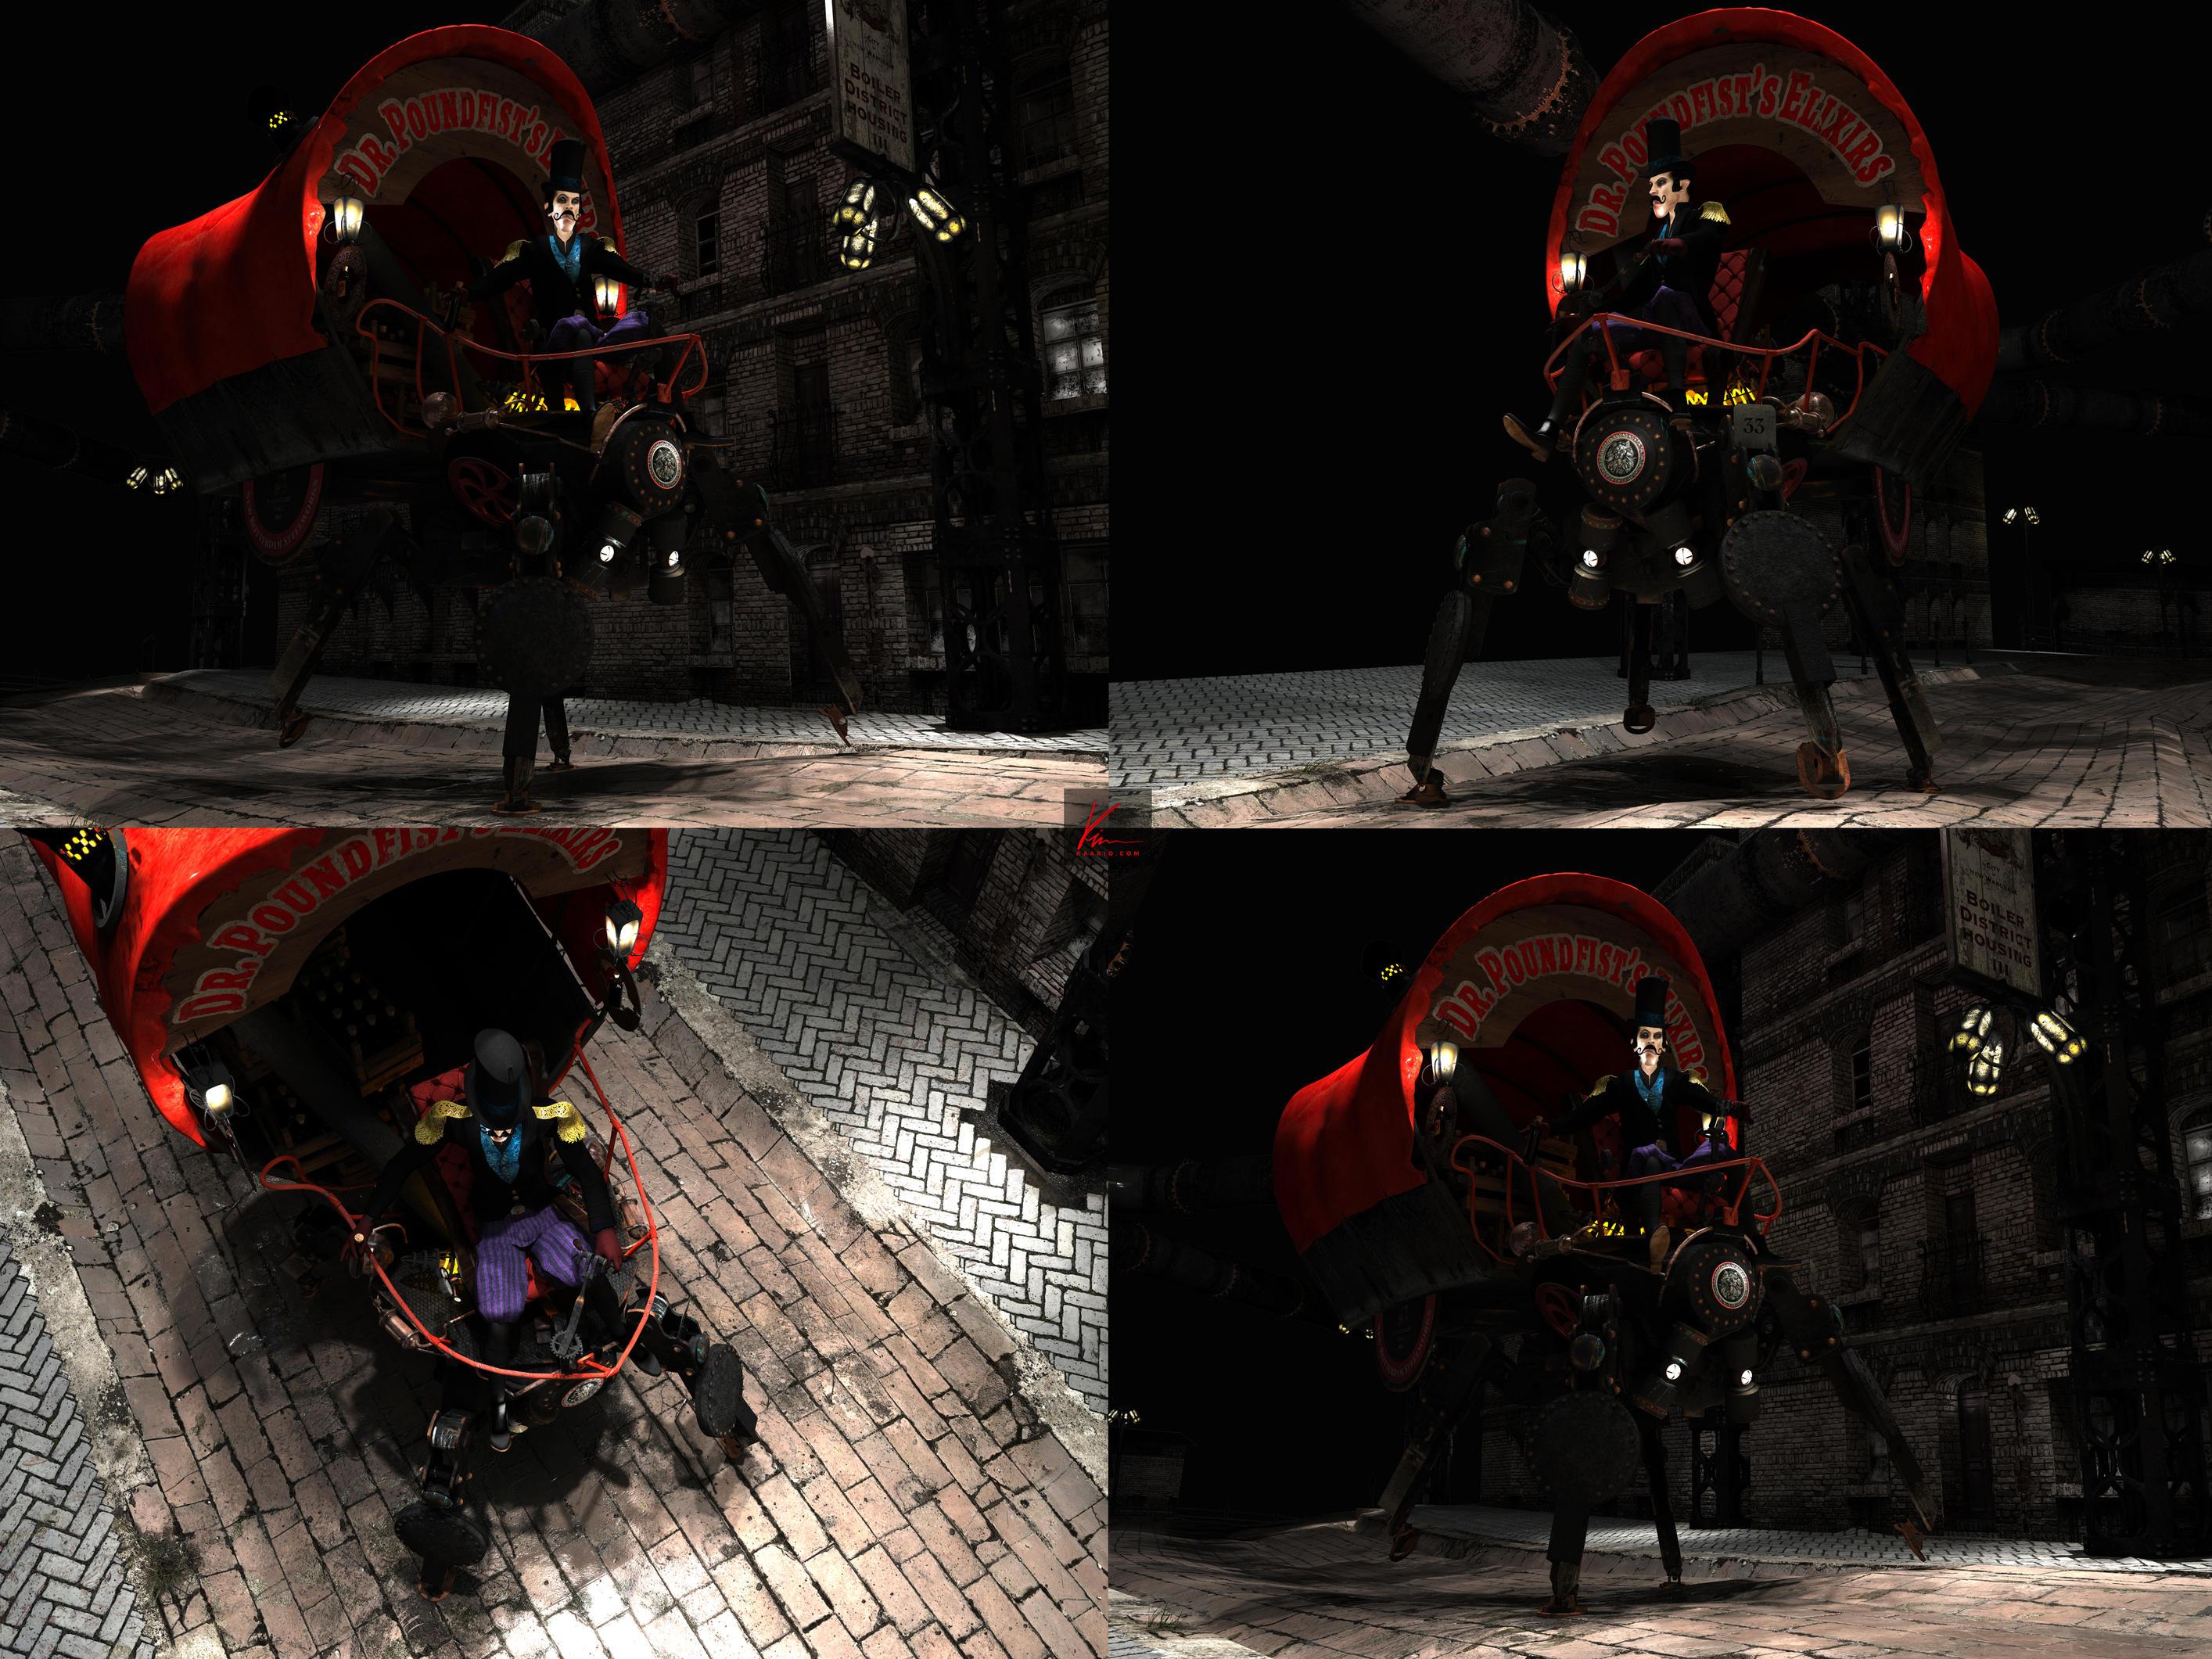 Steamwalker - preproduction shots by kaario